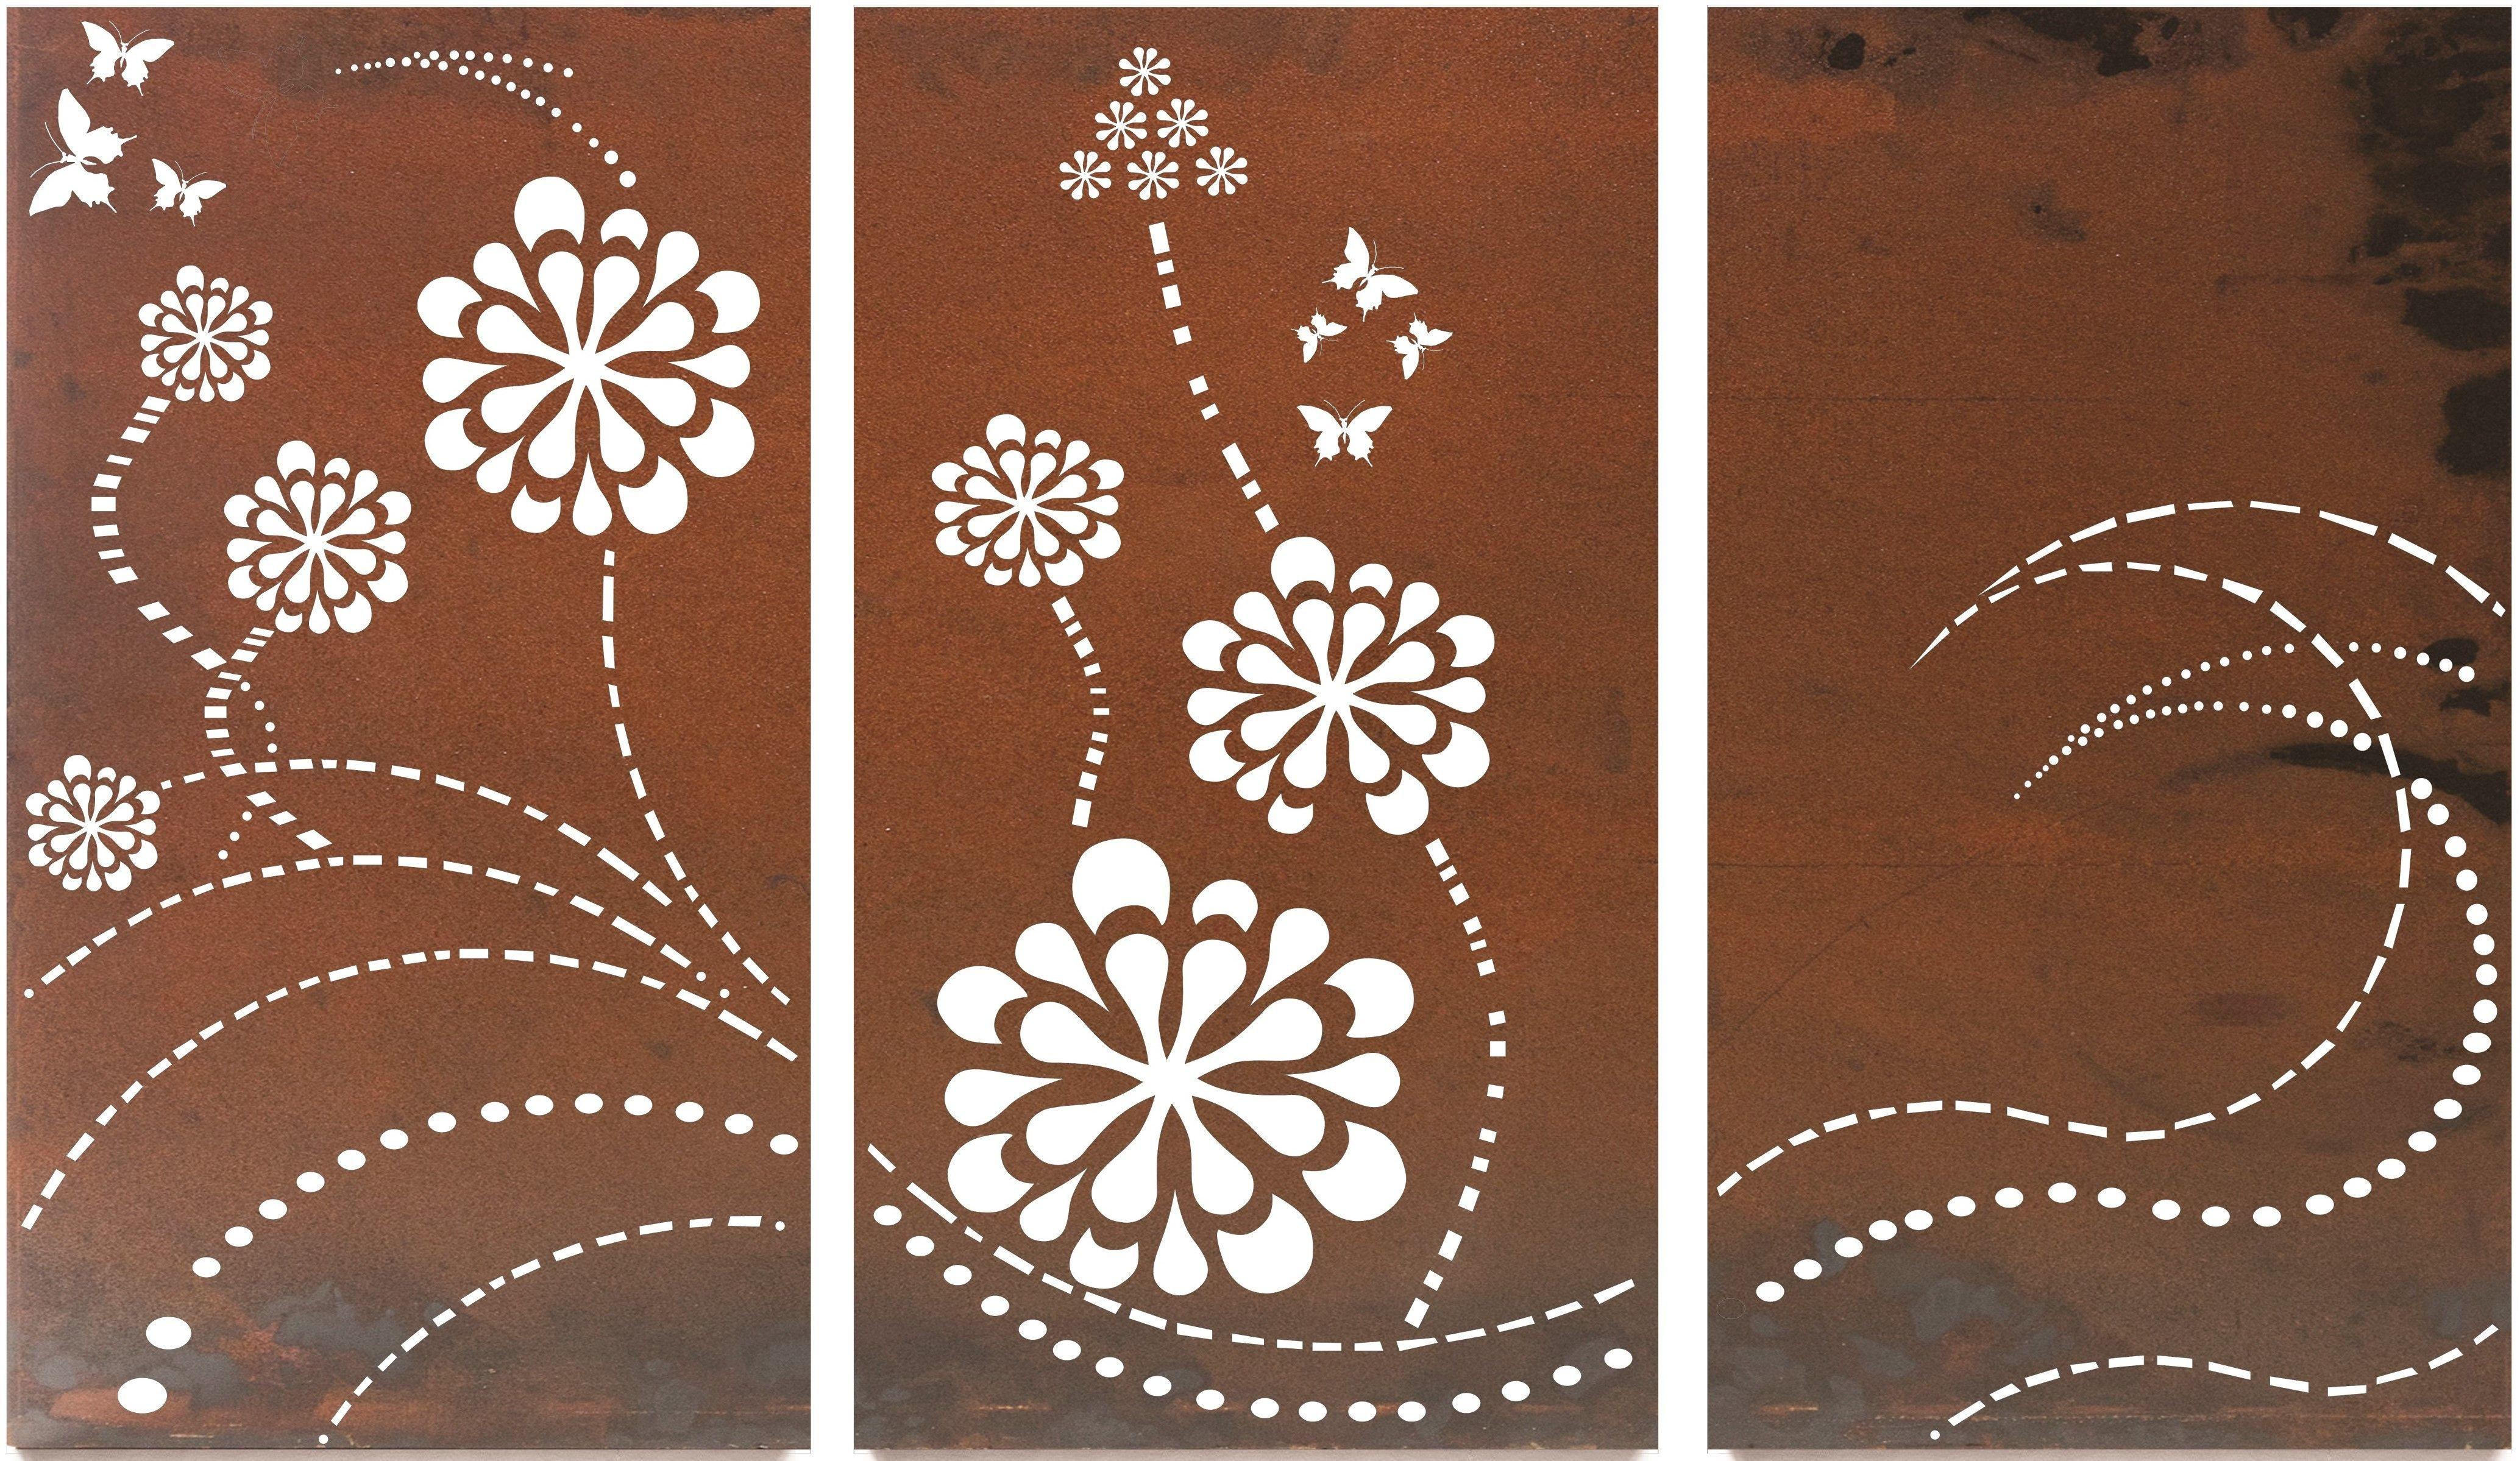 Flower Wave Triptych Large metal wall art, Metal garden